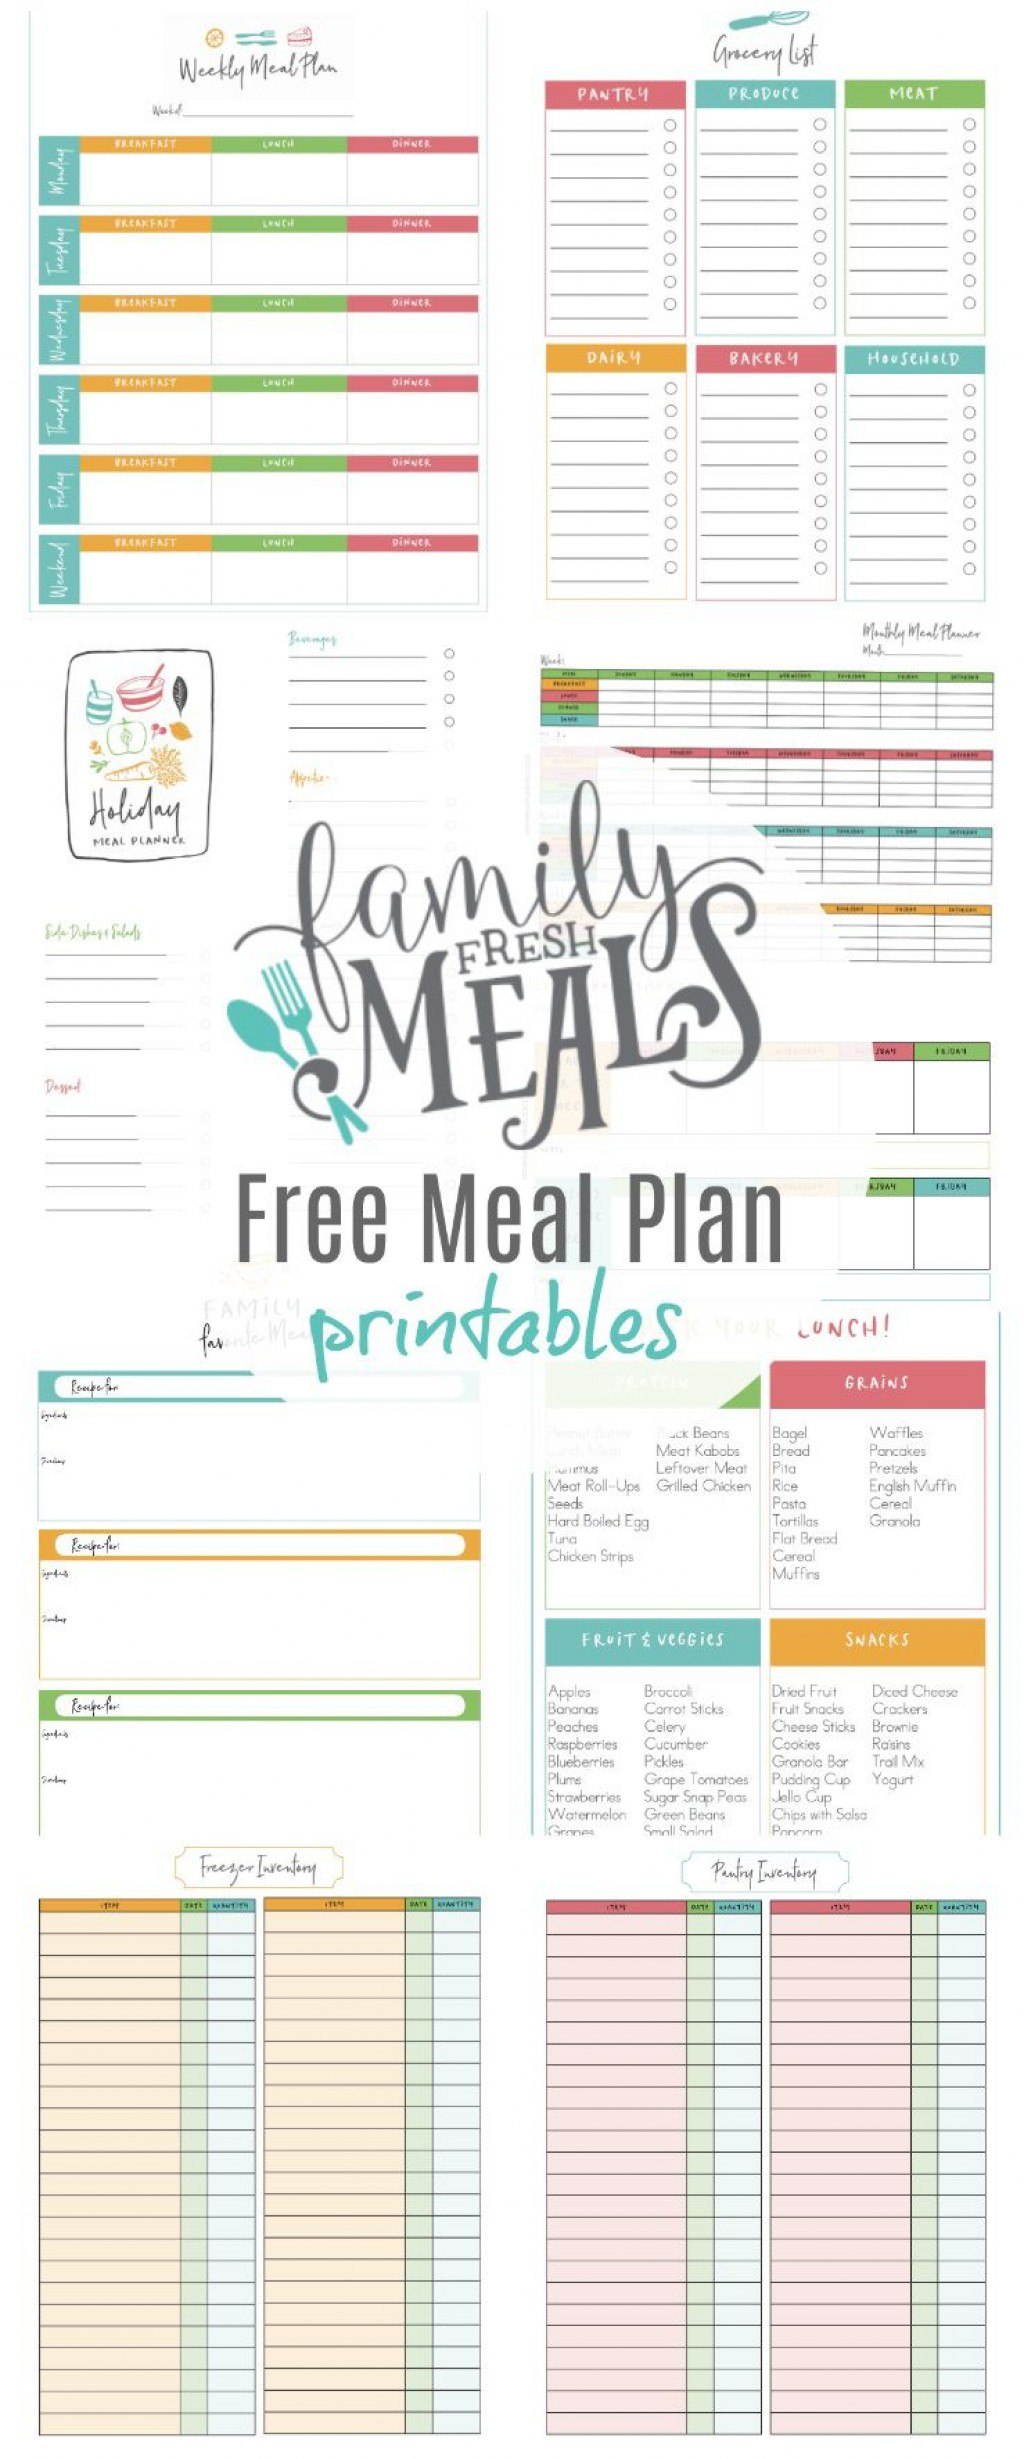 003 Unbelievable Meal Plan Printable Pdf Photo  Worksheet Downloadable Template SheetLarge